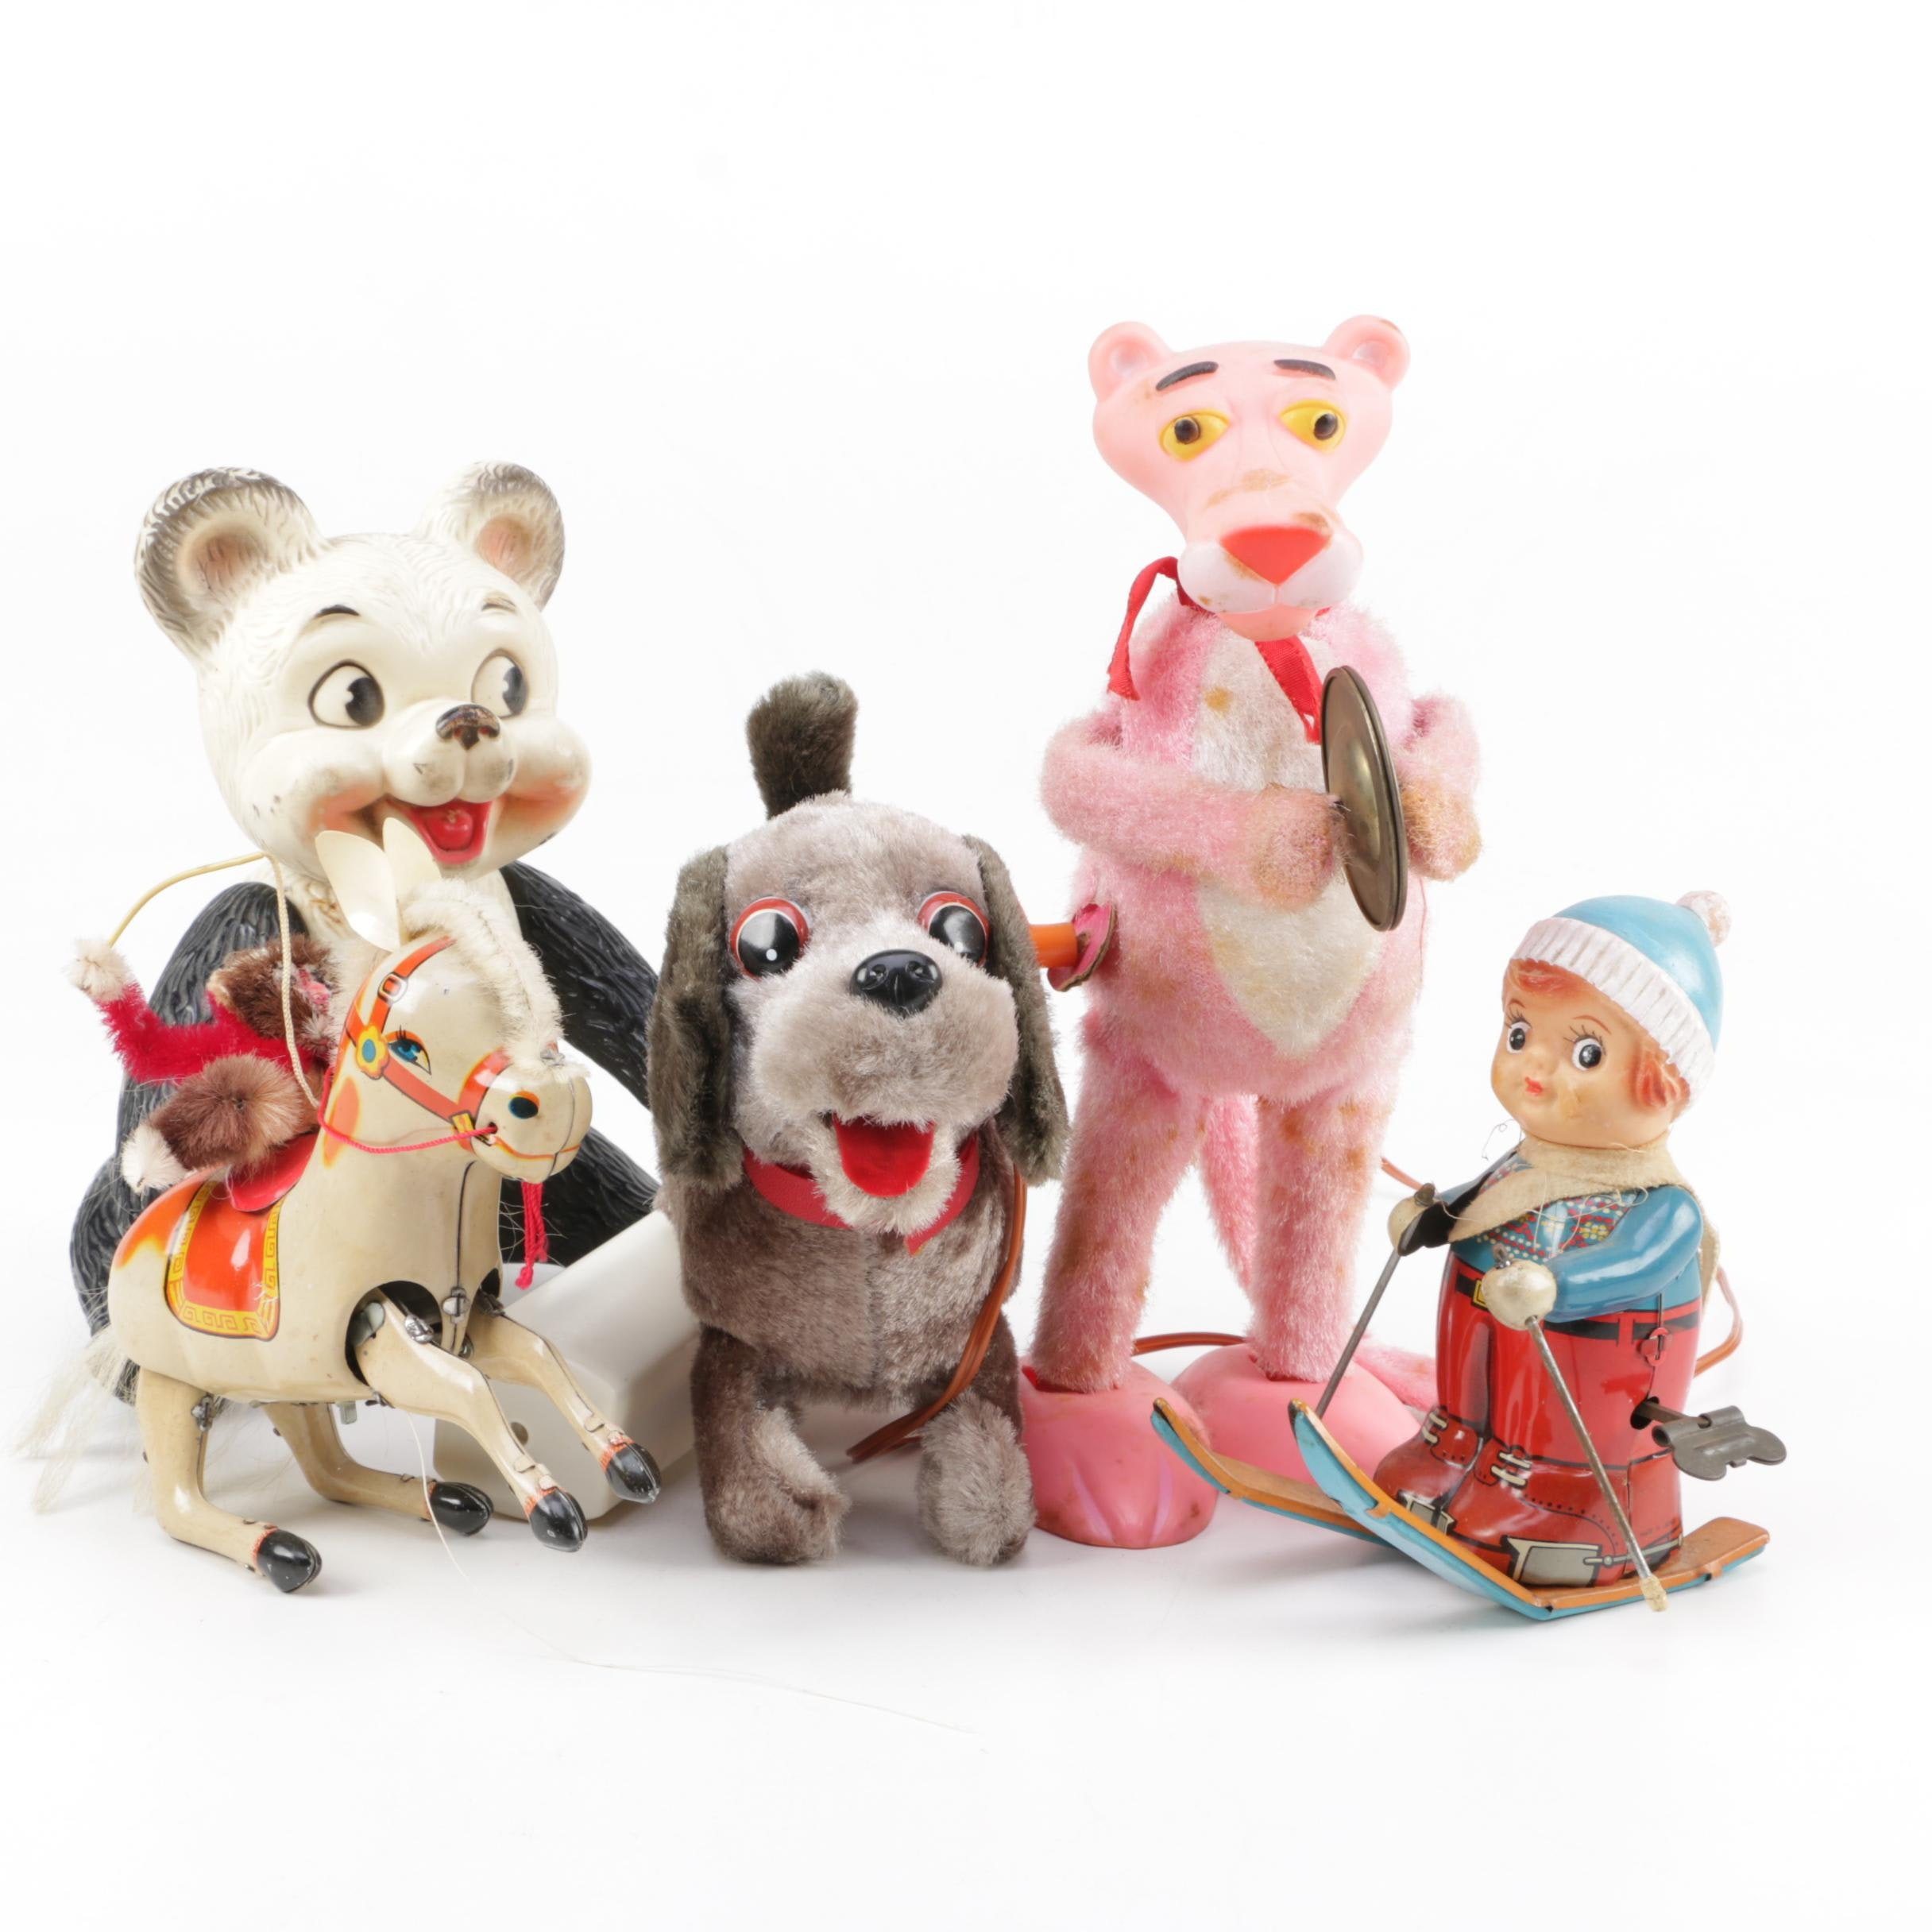 Vintage Toys Including Tin Litho Wind-Up Toys